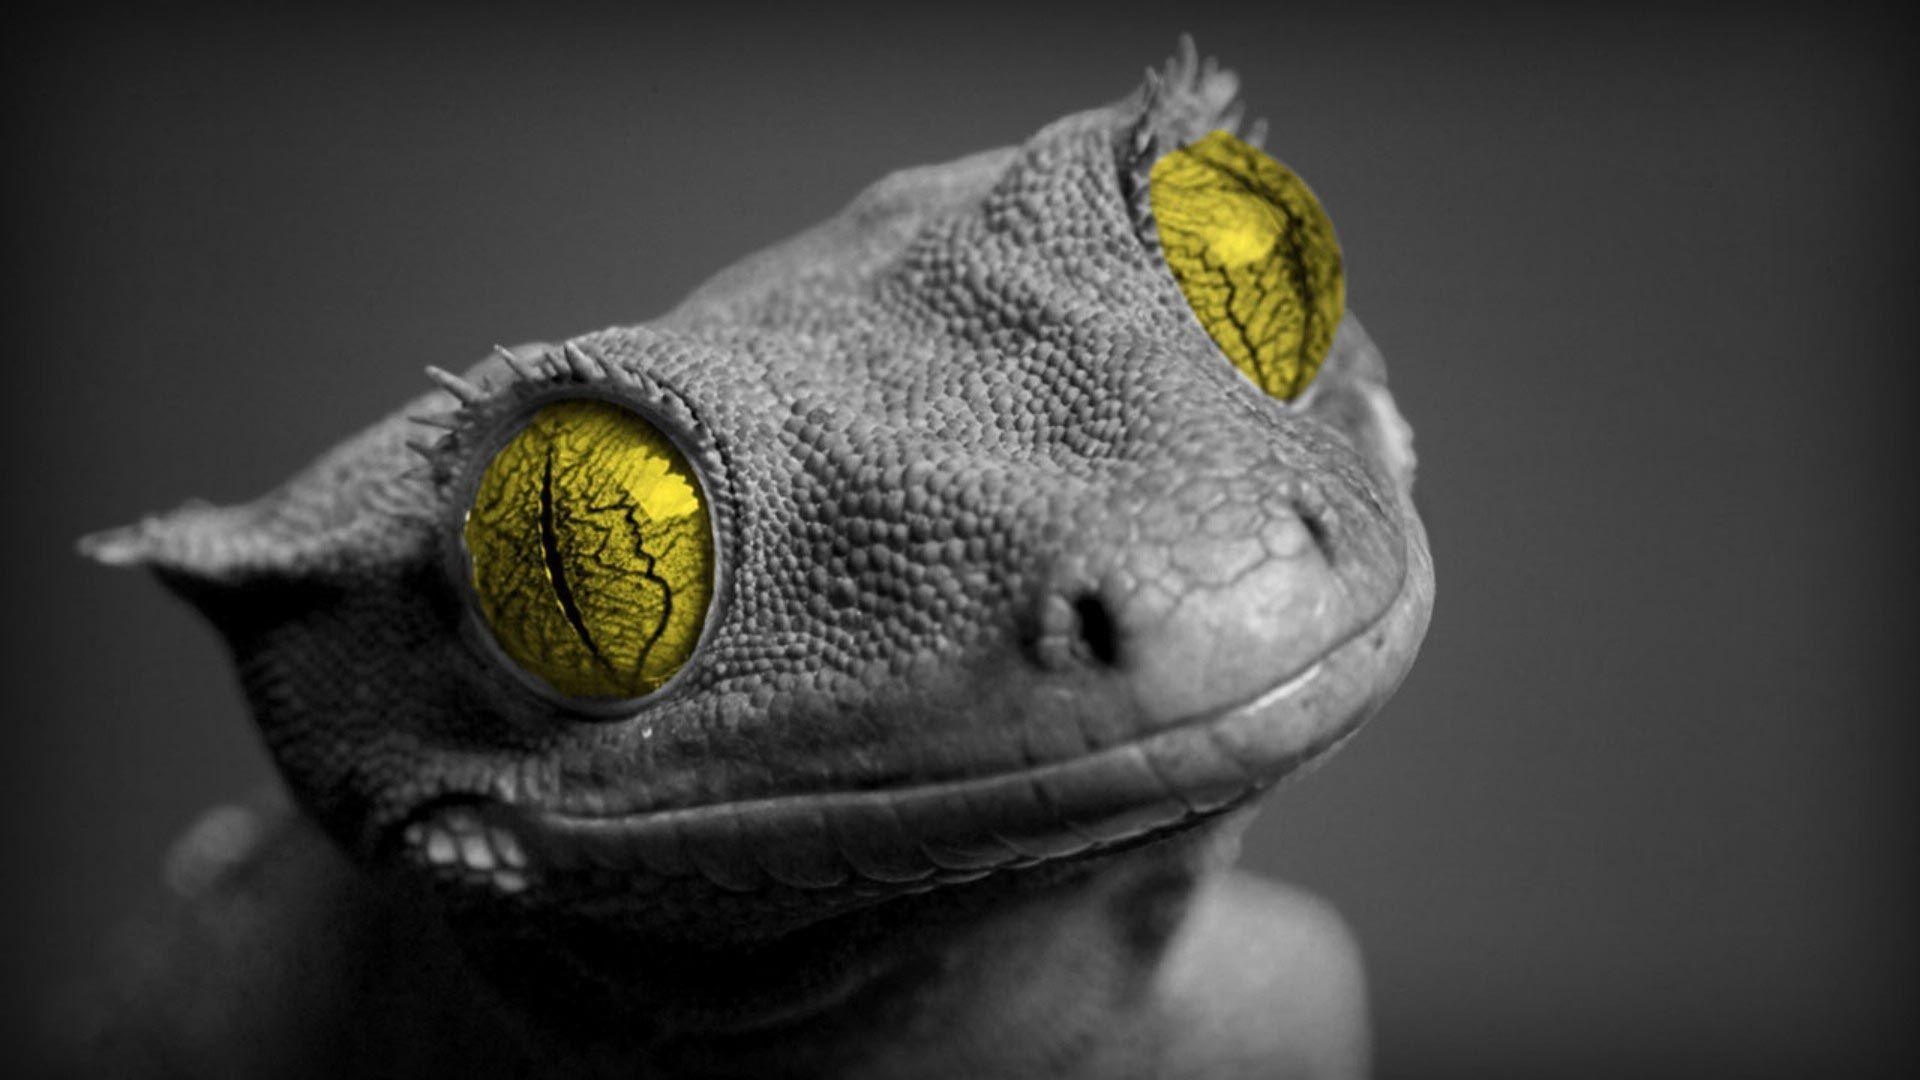 Furious Colorful Lizard Wallpaper HD Animals and Birds 3D